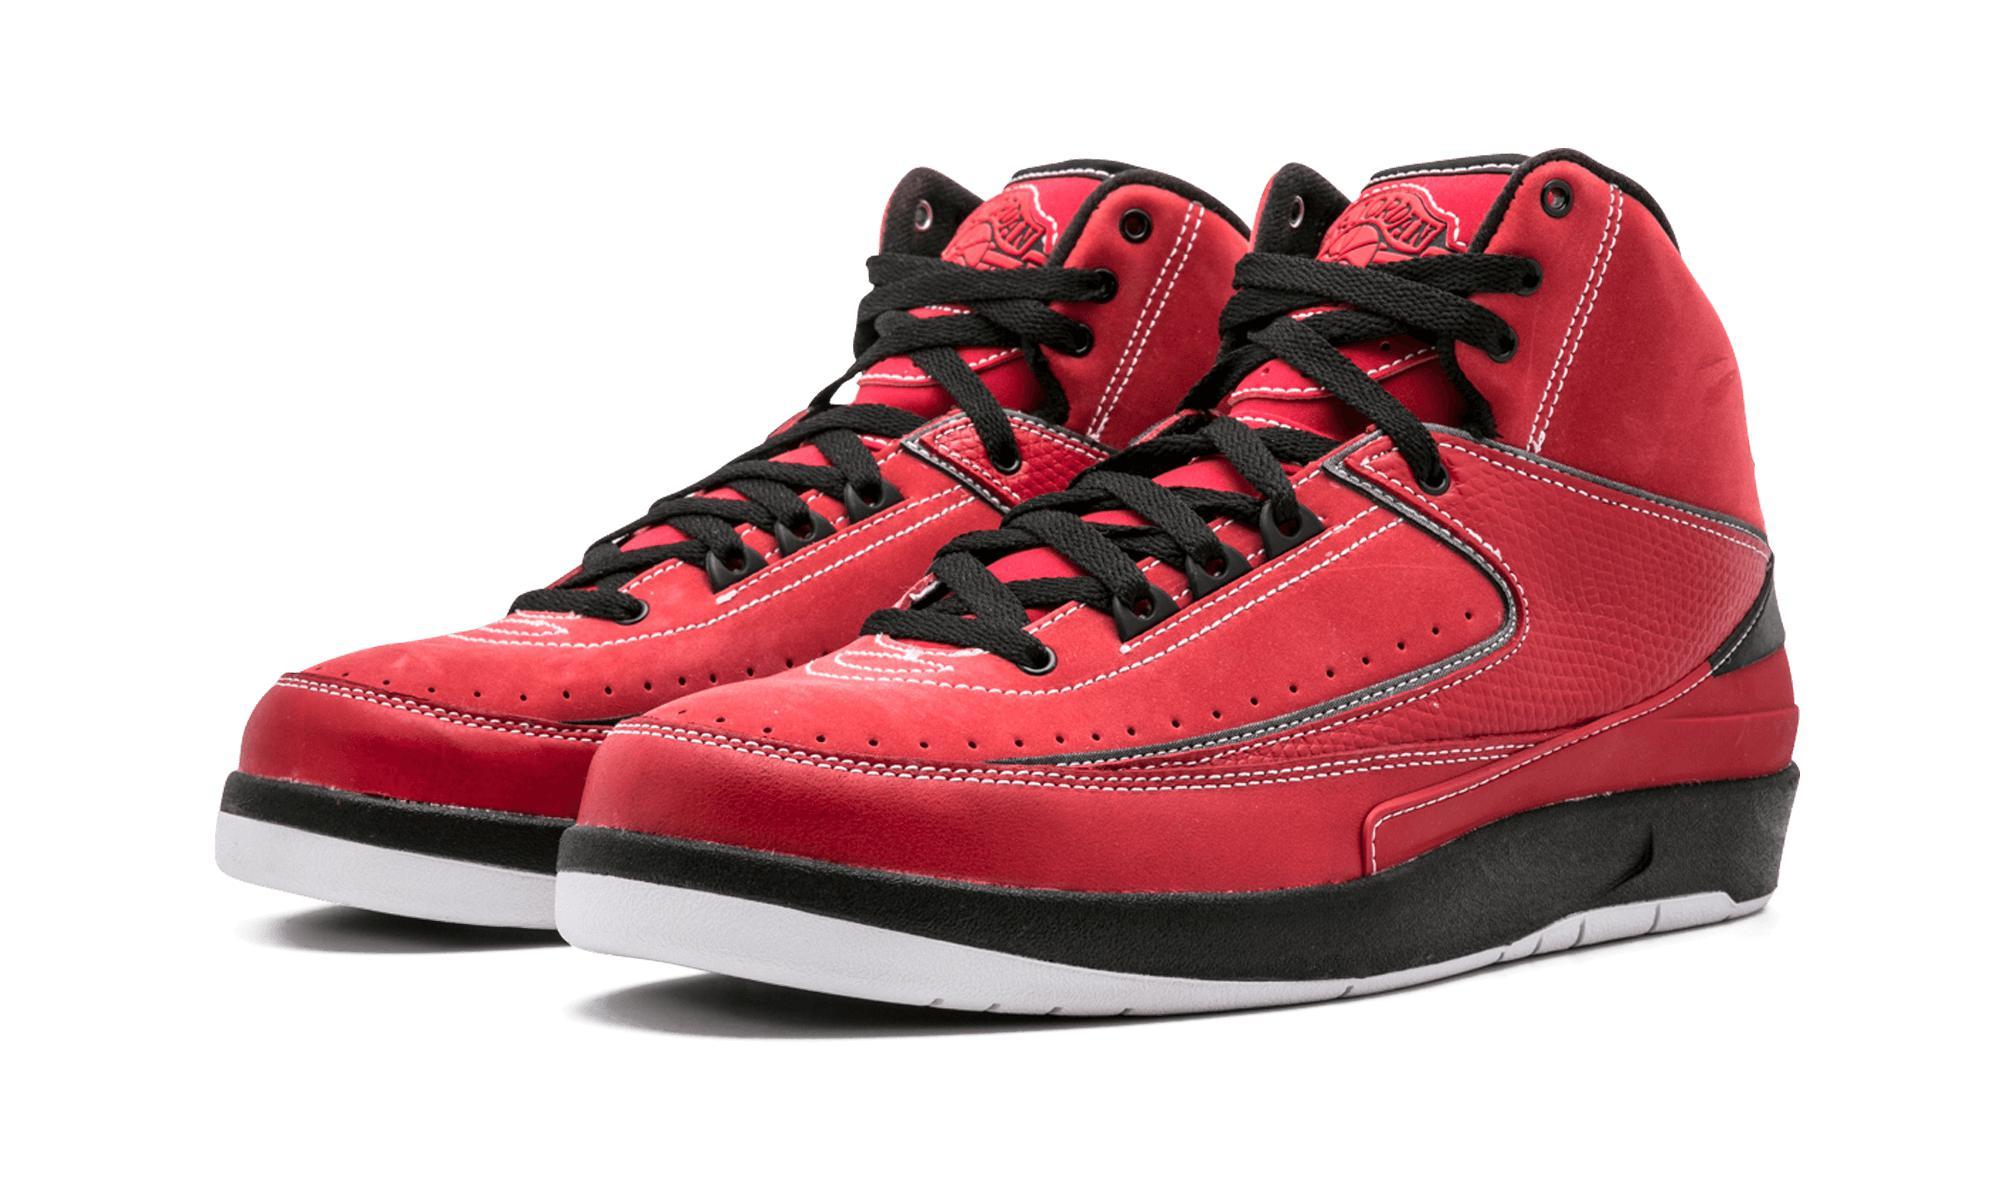 868a91e3219c Nike - Red Air 2 Retro Qf for Men - Lyst. View fullscreen